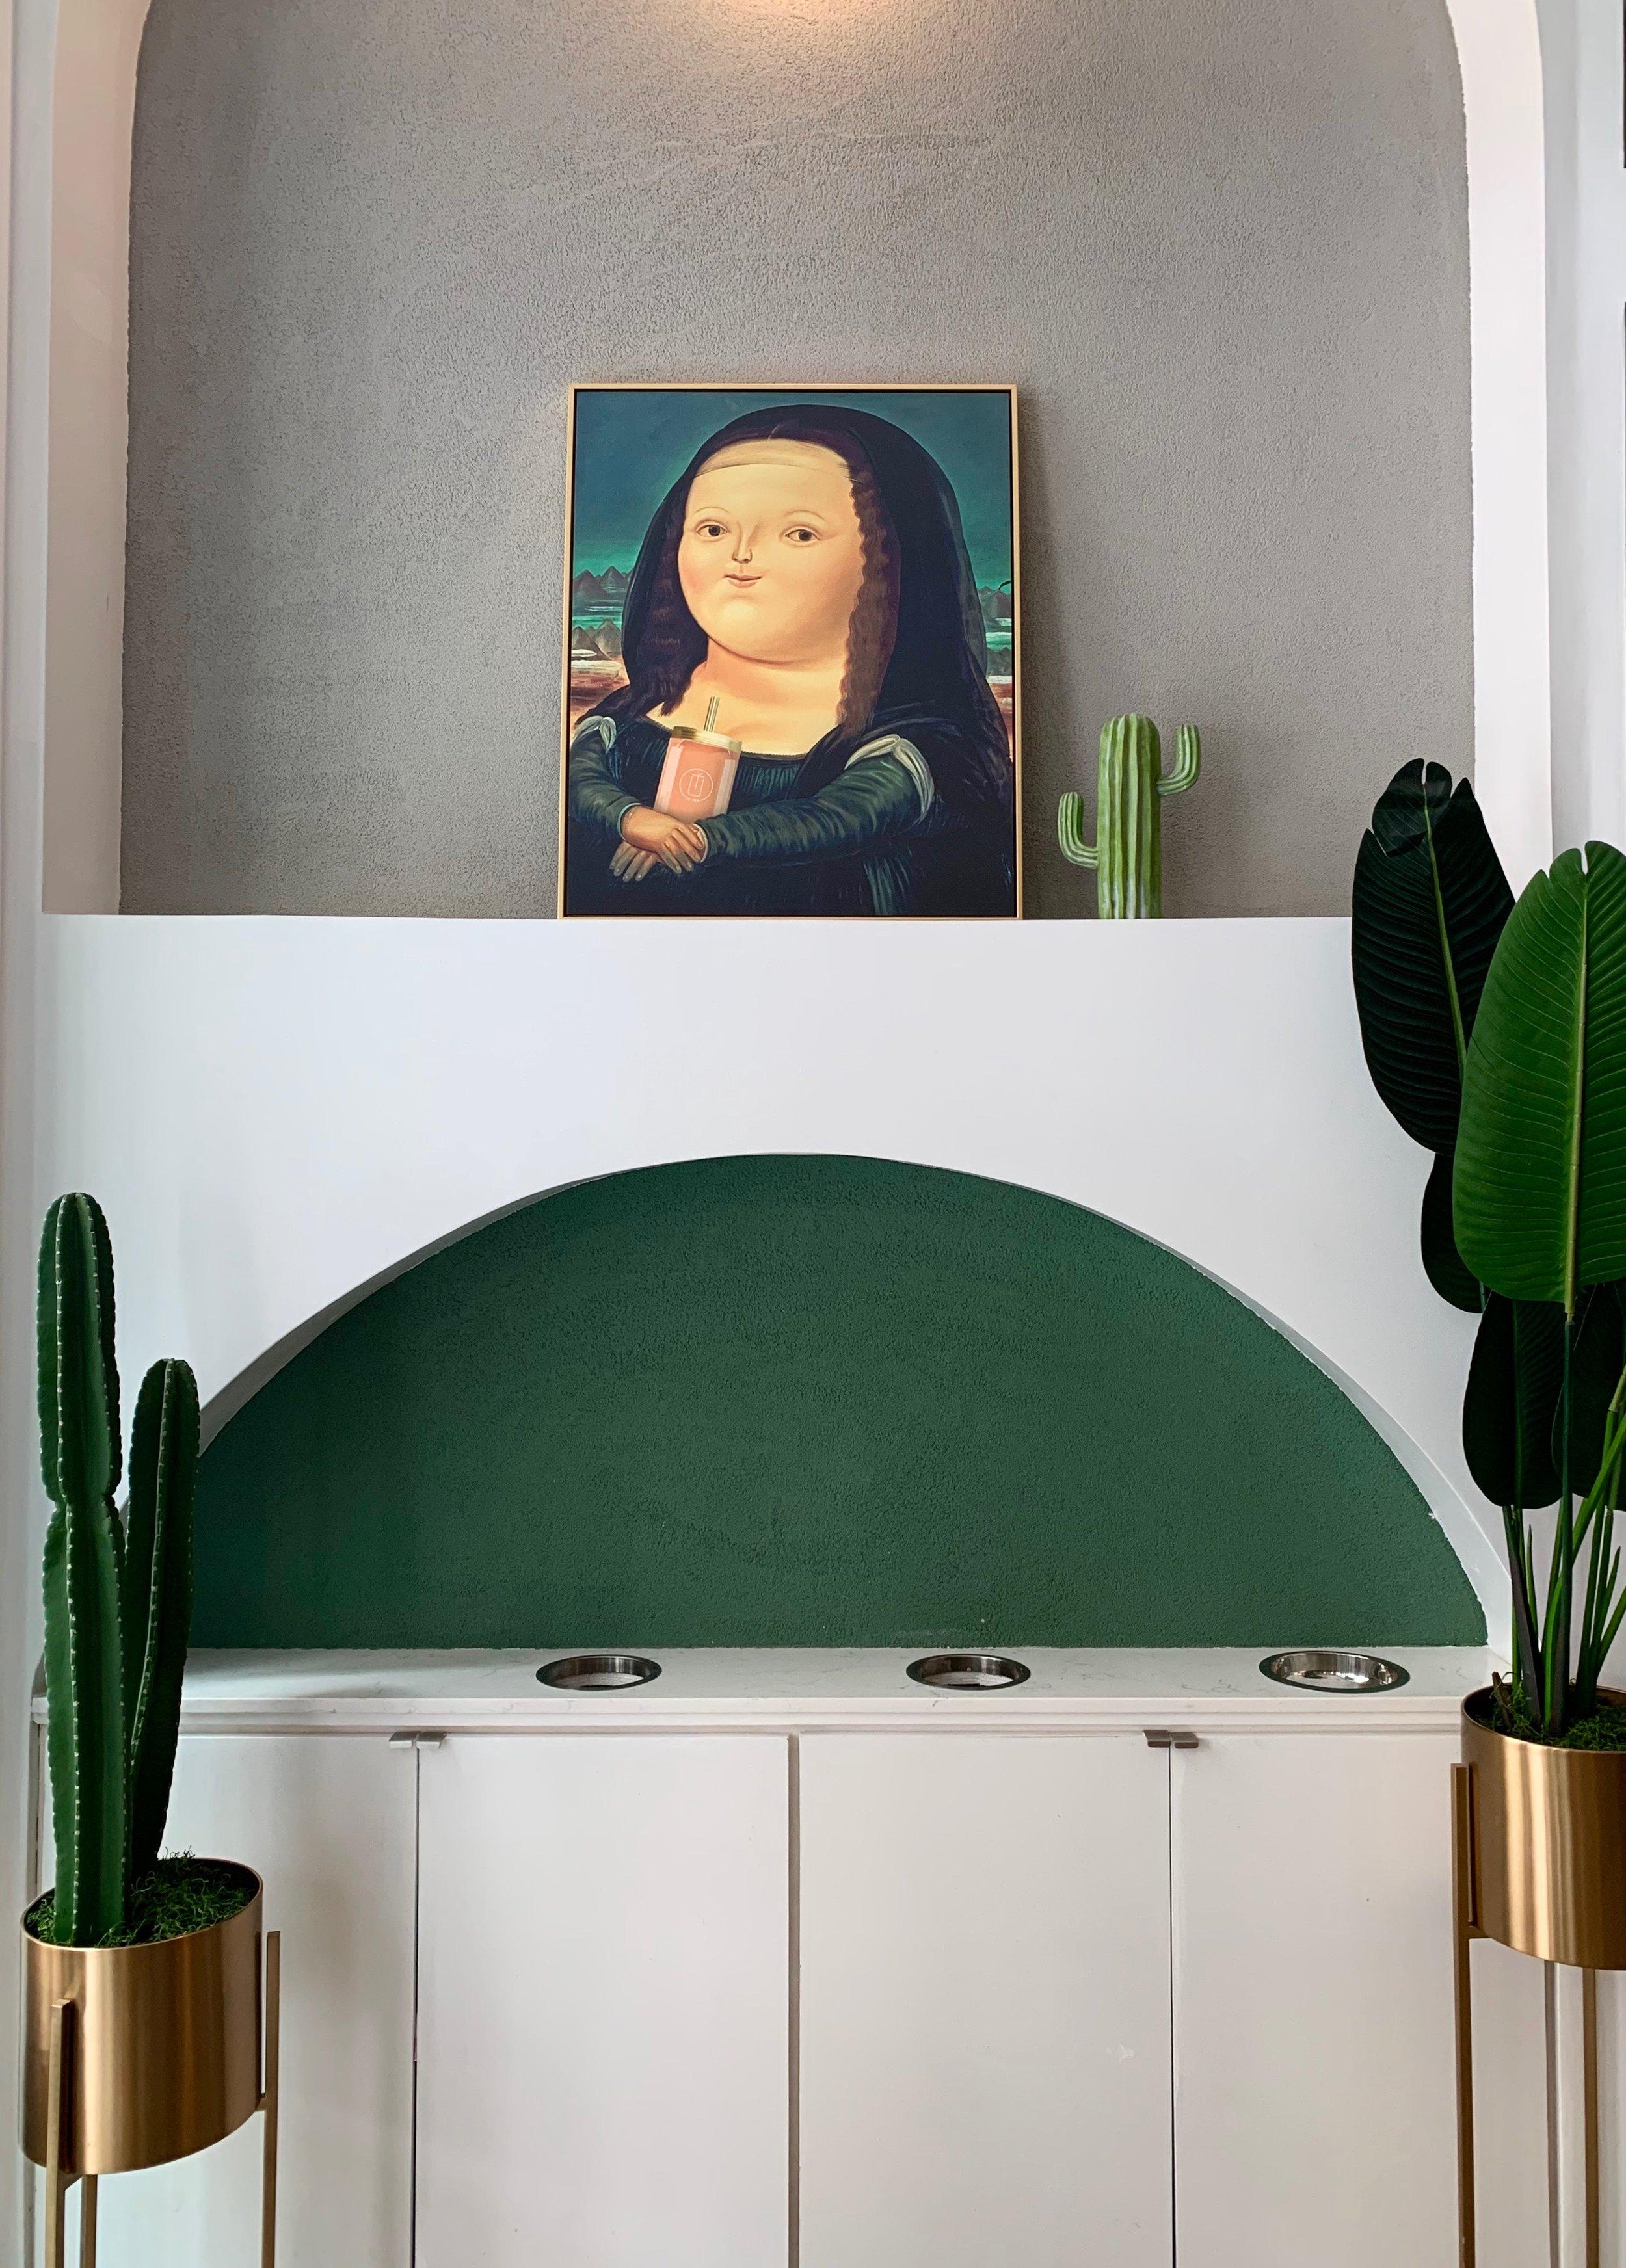 Mona Lisa drawing hugging Le Tea drink